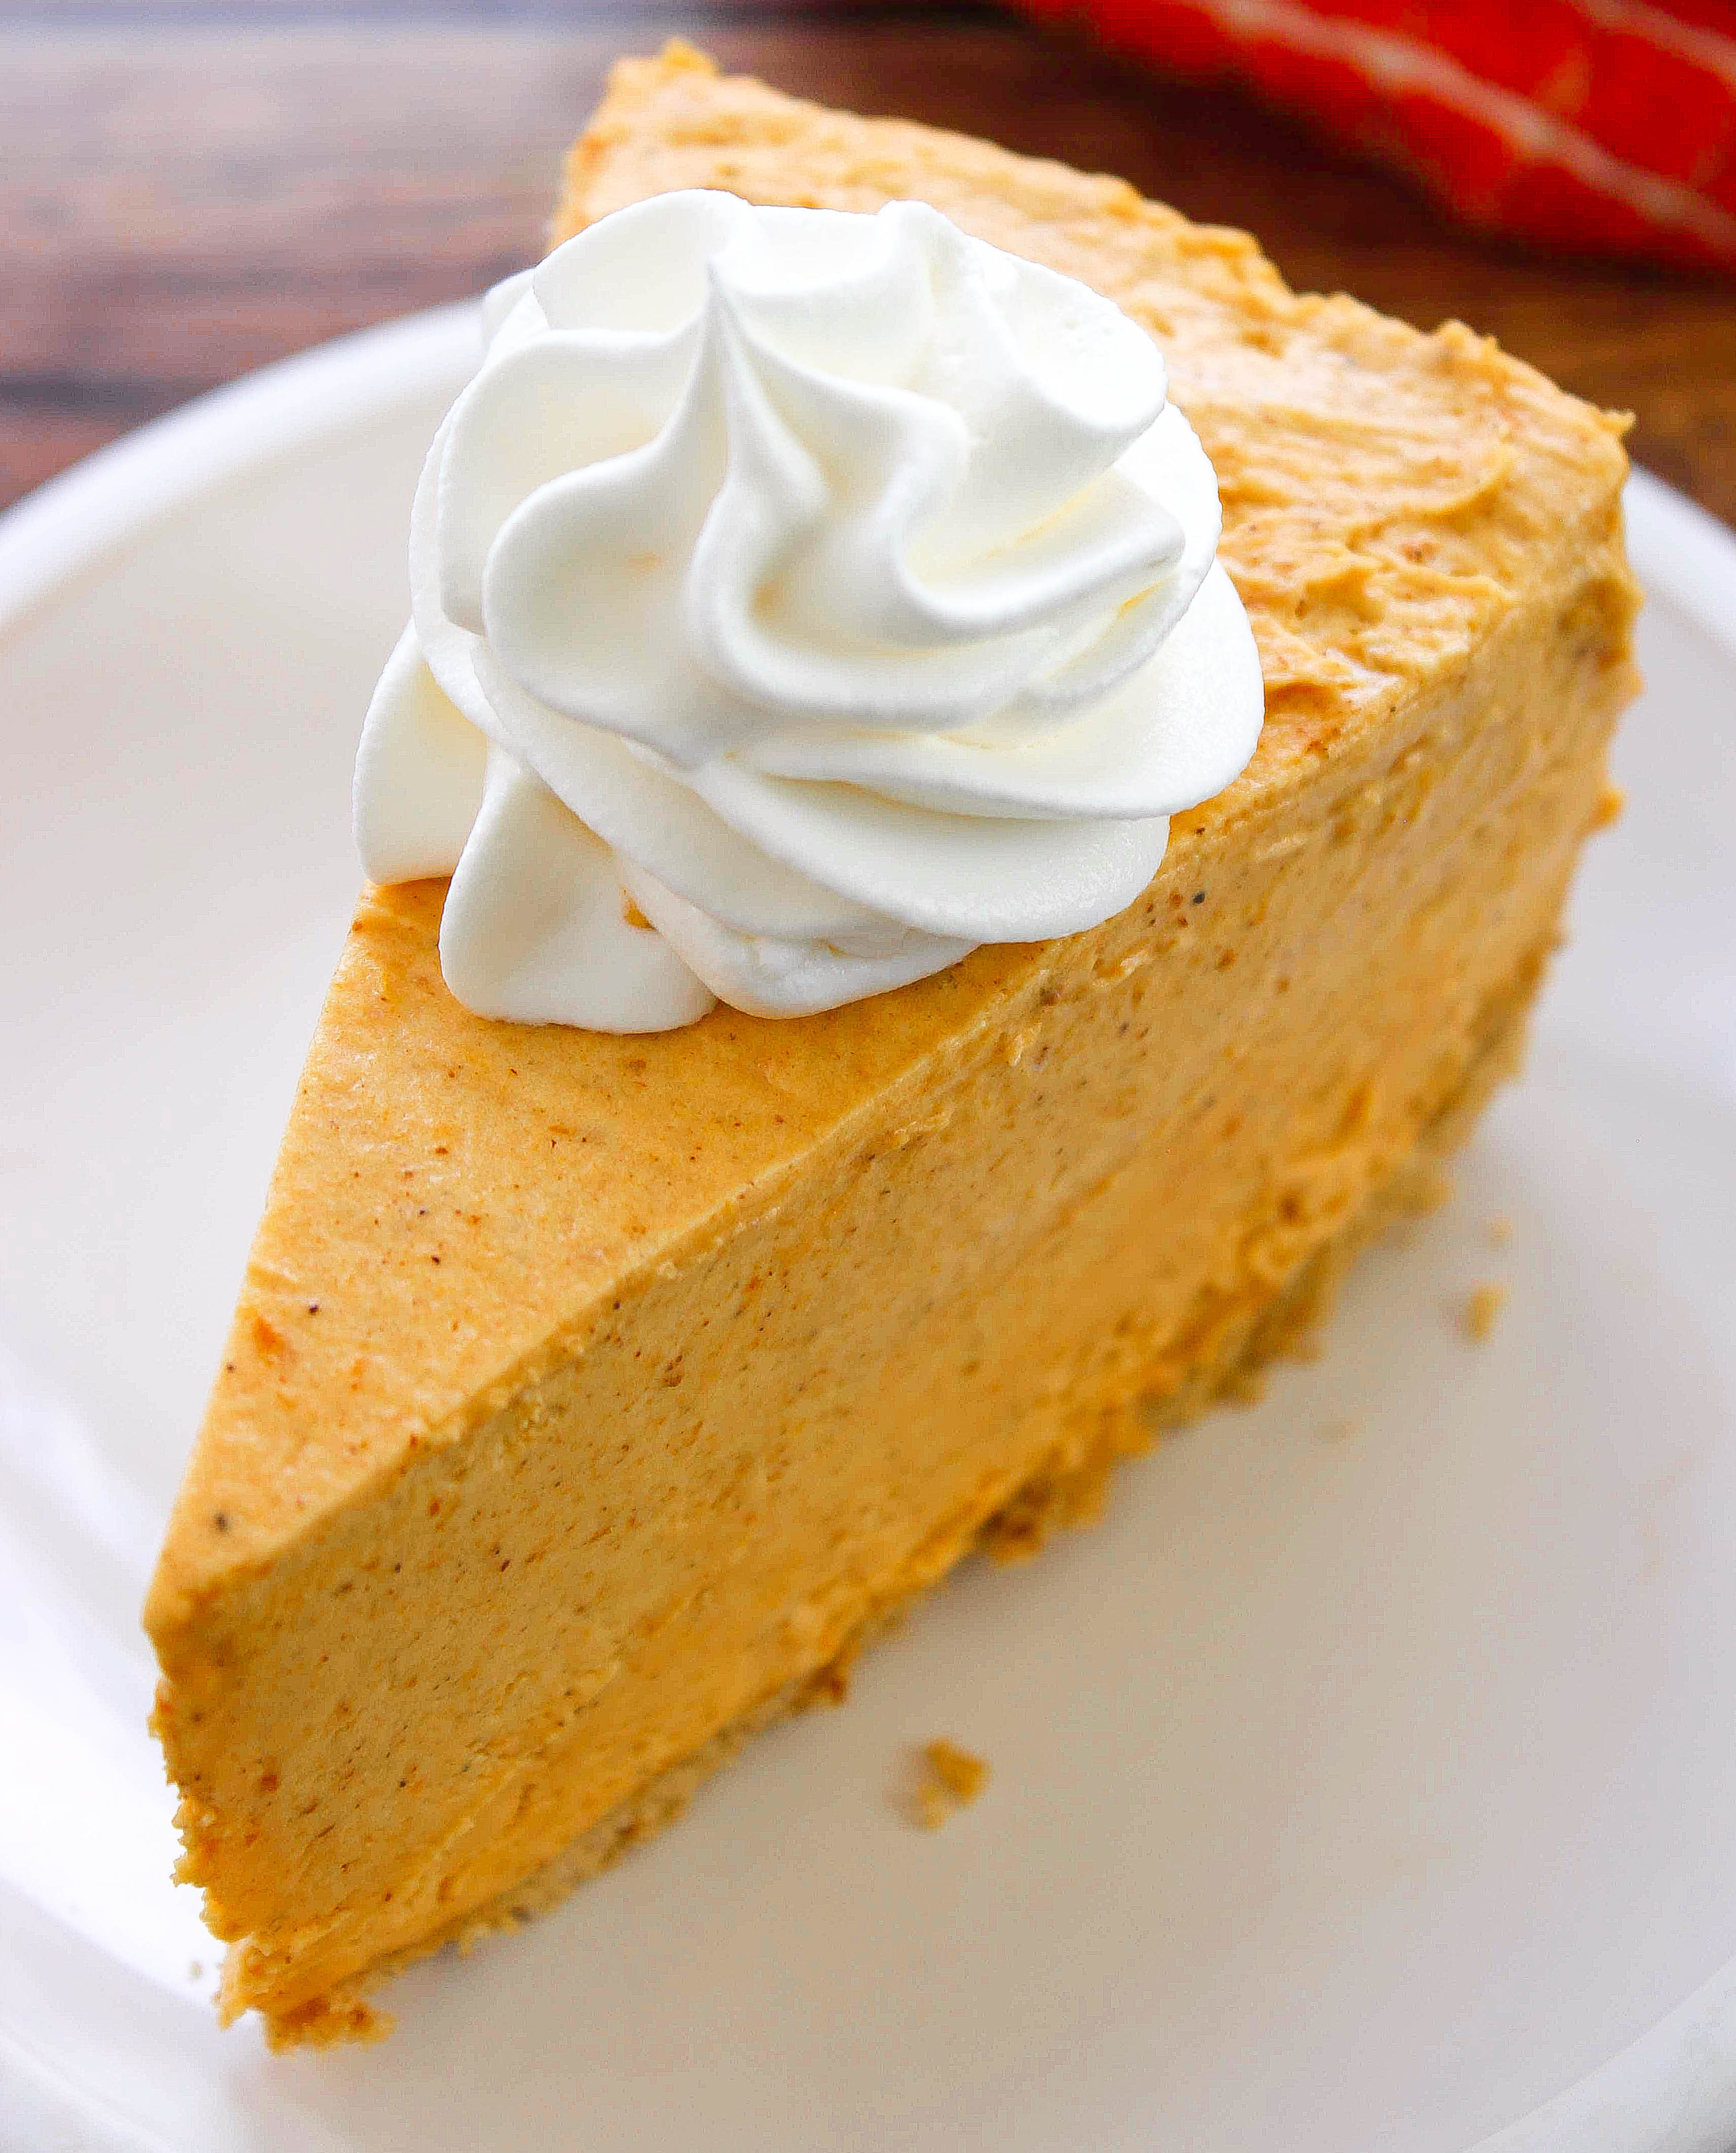 Pumpkin Cheesecake Recipe  Cheesecake Factory Copycat Pumpkin Cheesecake Baking Beauty